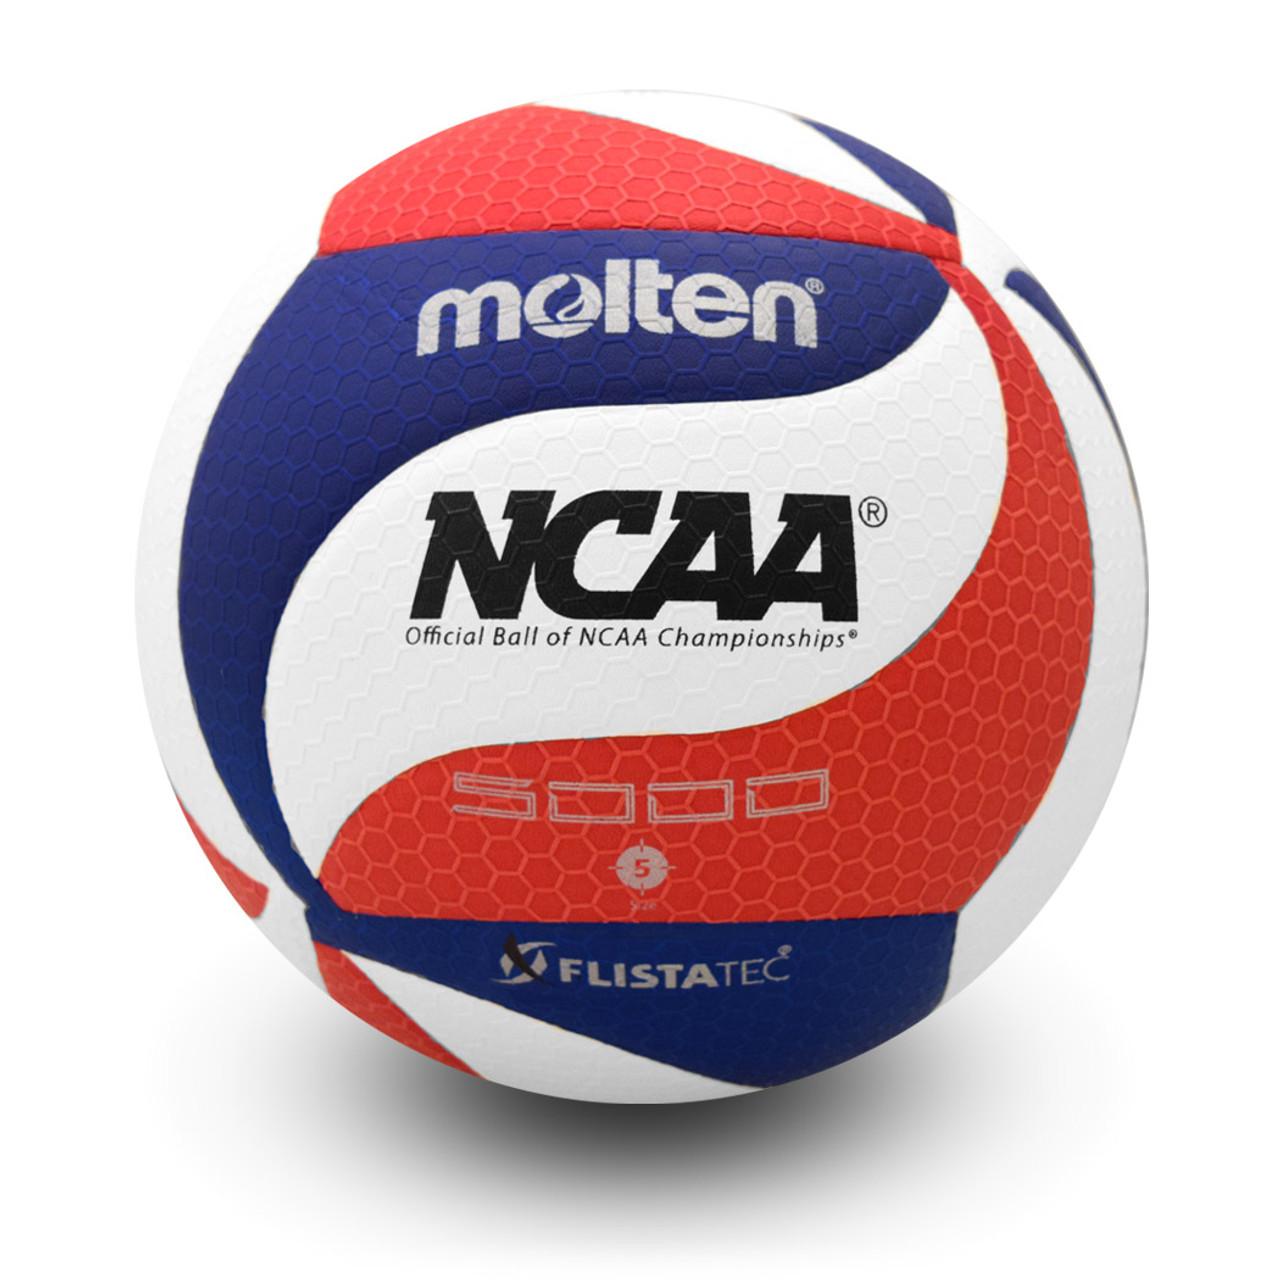 Ncaa Flistatec Volleyball Molten Usa